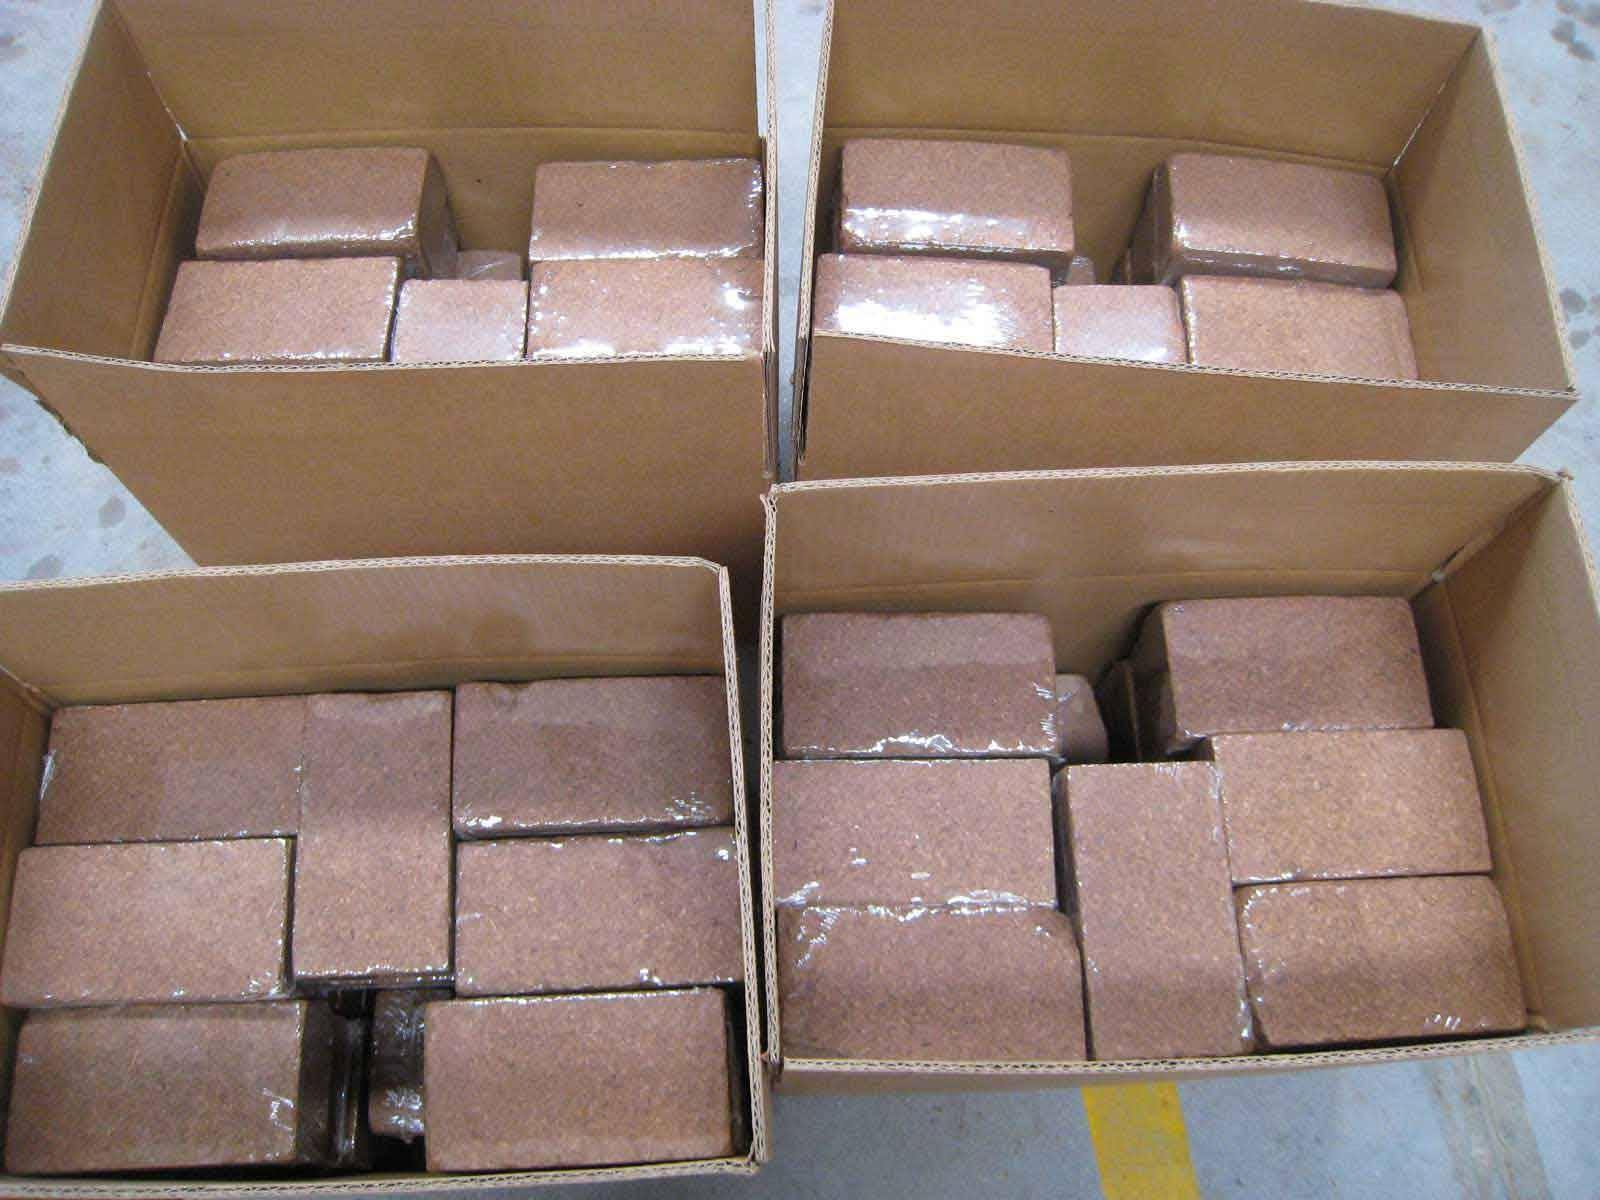 650gm CoCo Peat Bricks